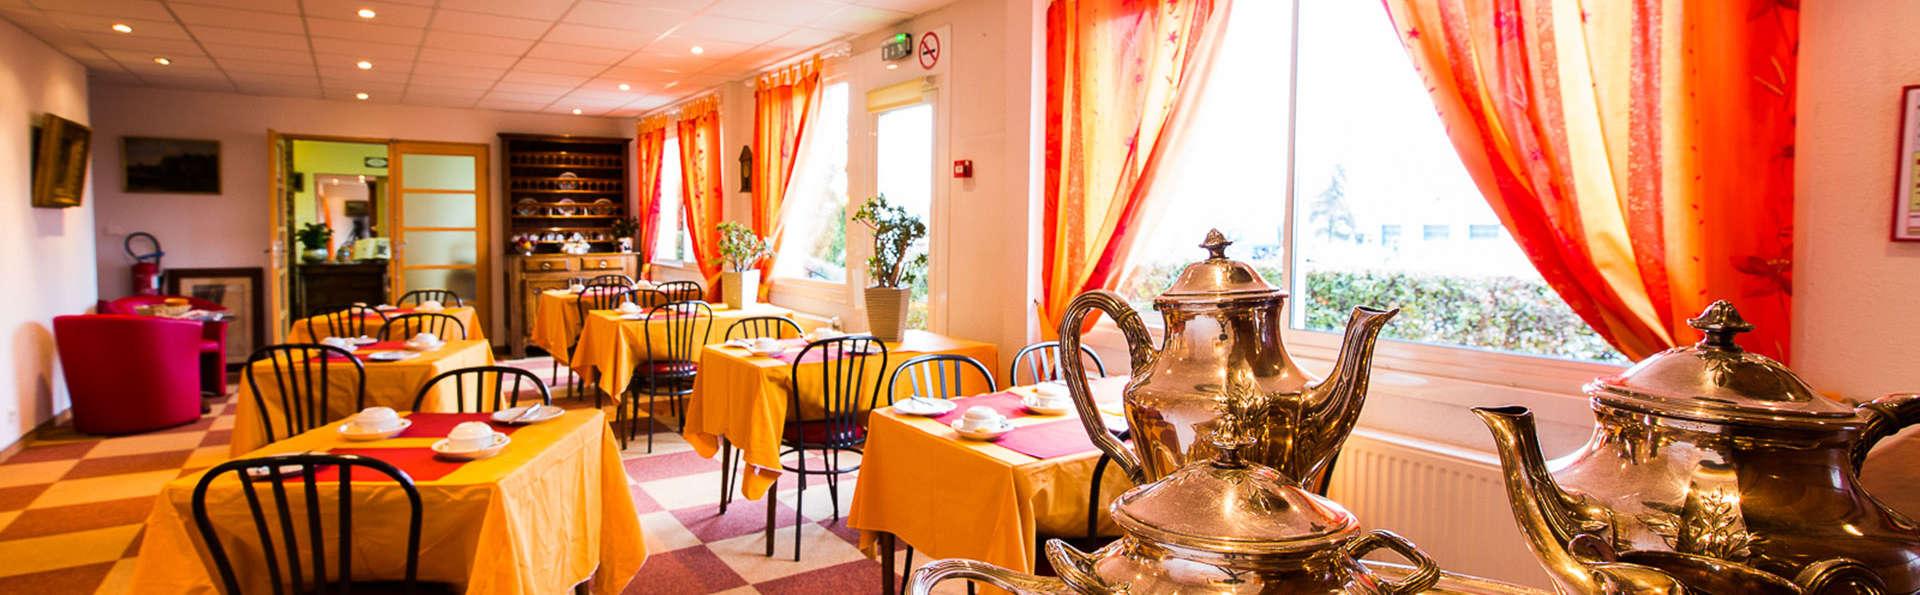 Hôtel Le Pacifique - EDIT_breakfastroom3.jpg